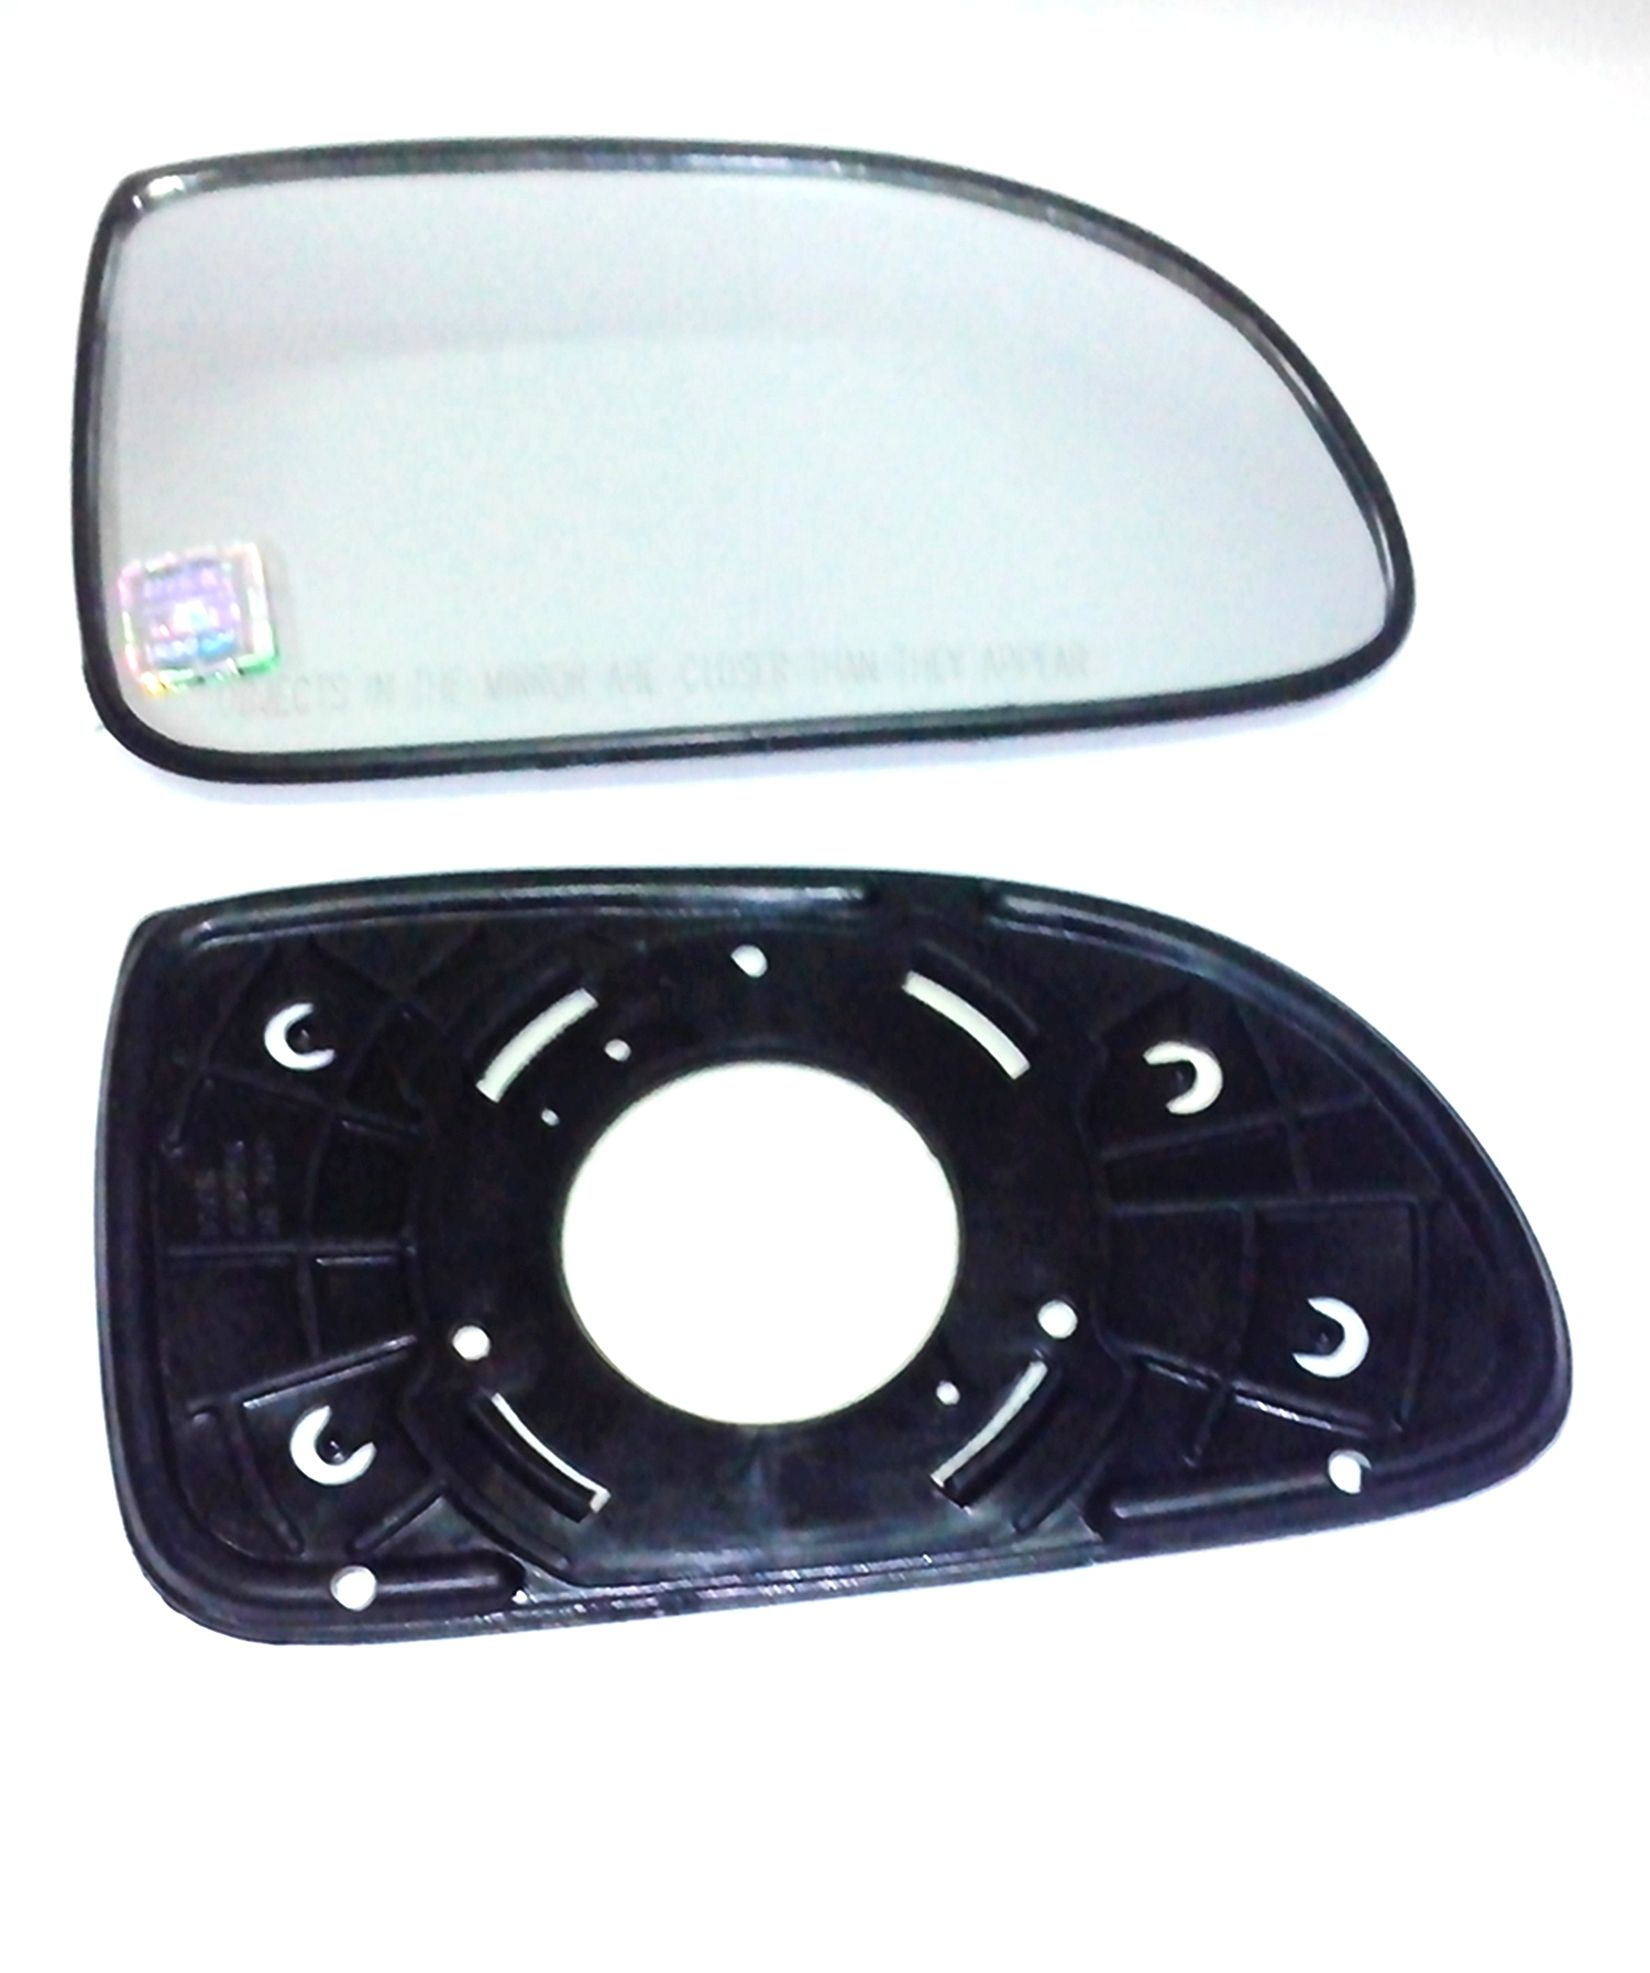 MANTRA-CONVEX MIRROR PLATES (SUB MIRROR PLATES) FOR HYUNDAI ACCENT LEFT SIDE